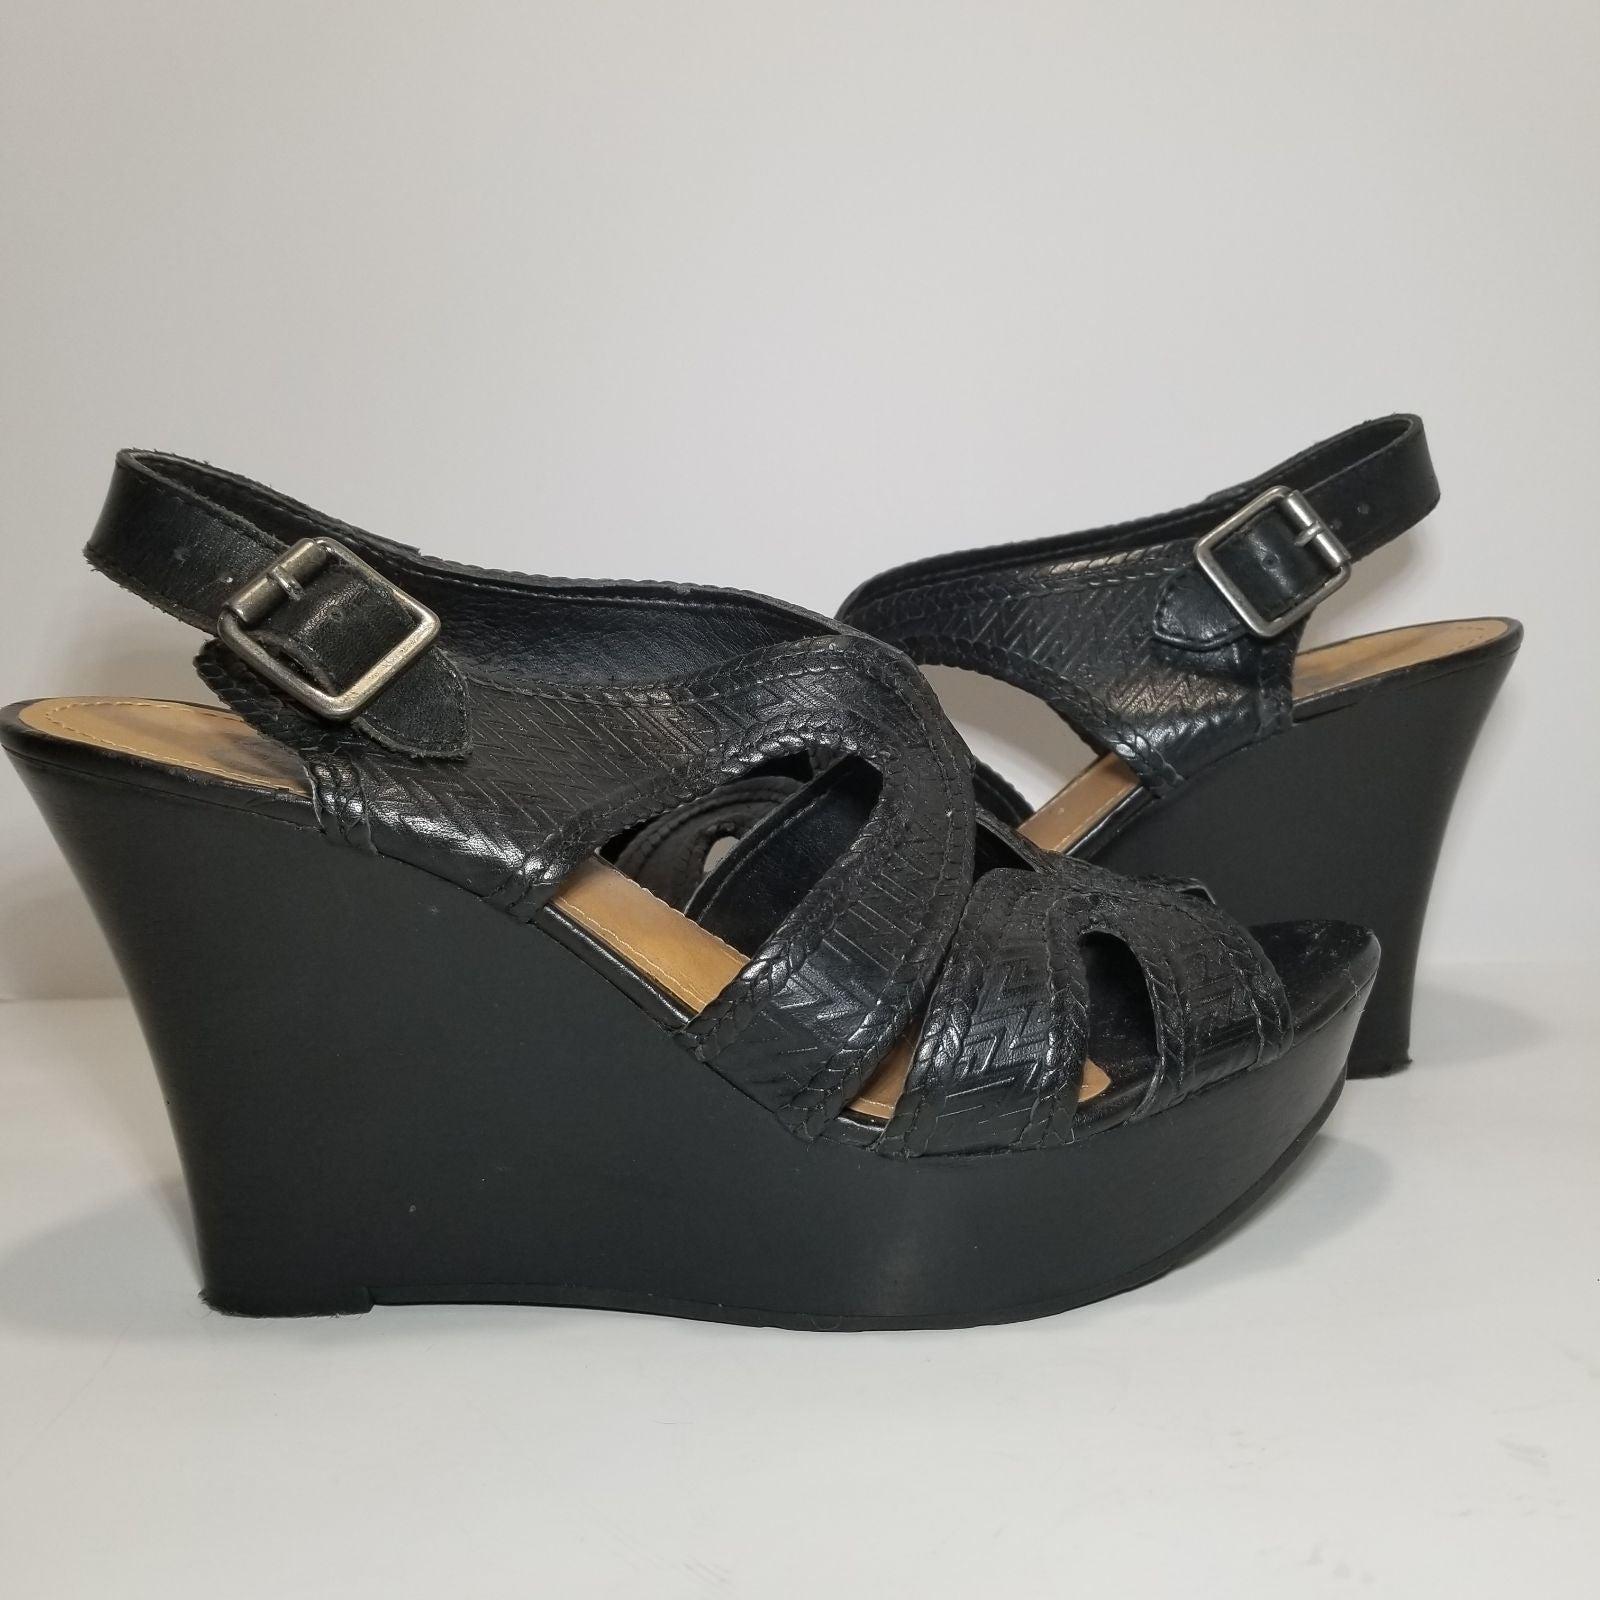 GB Gianni Bini Black Wedge Sandals